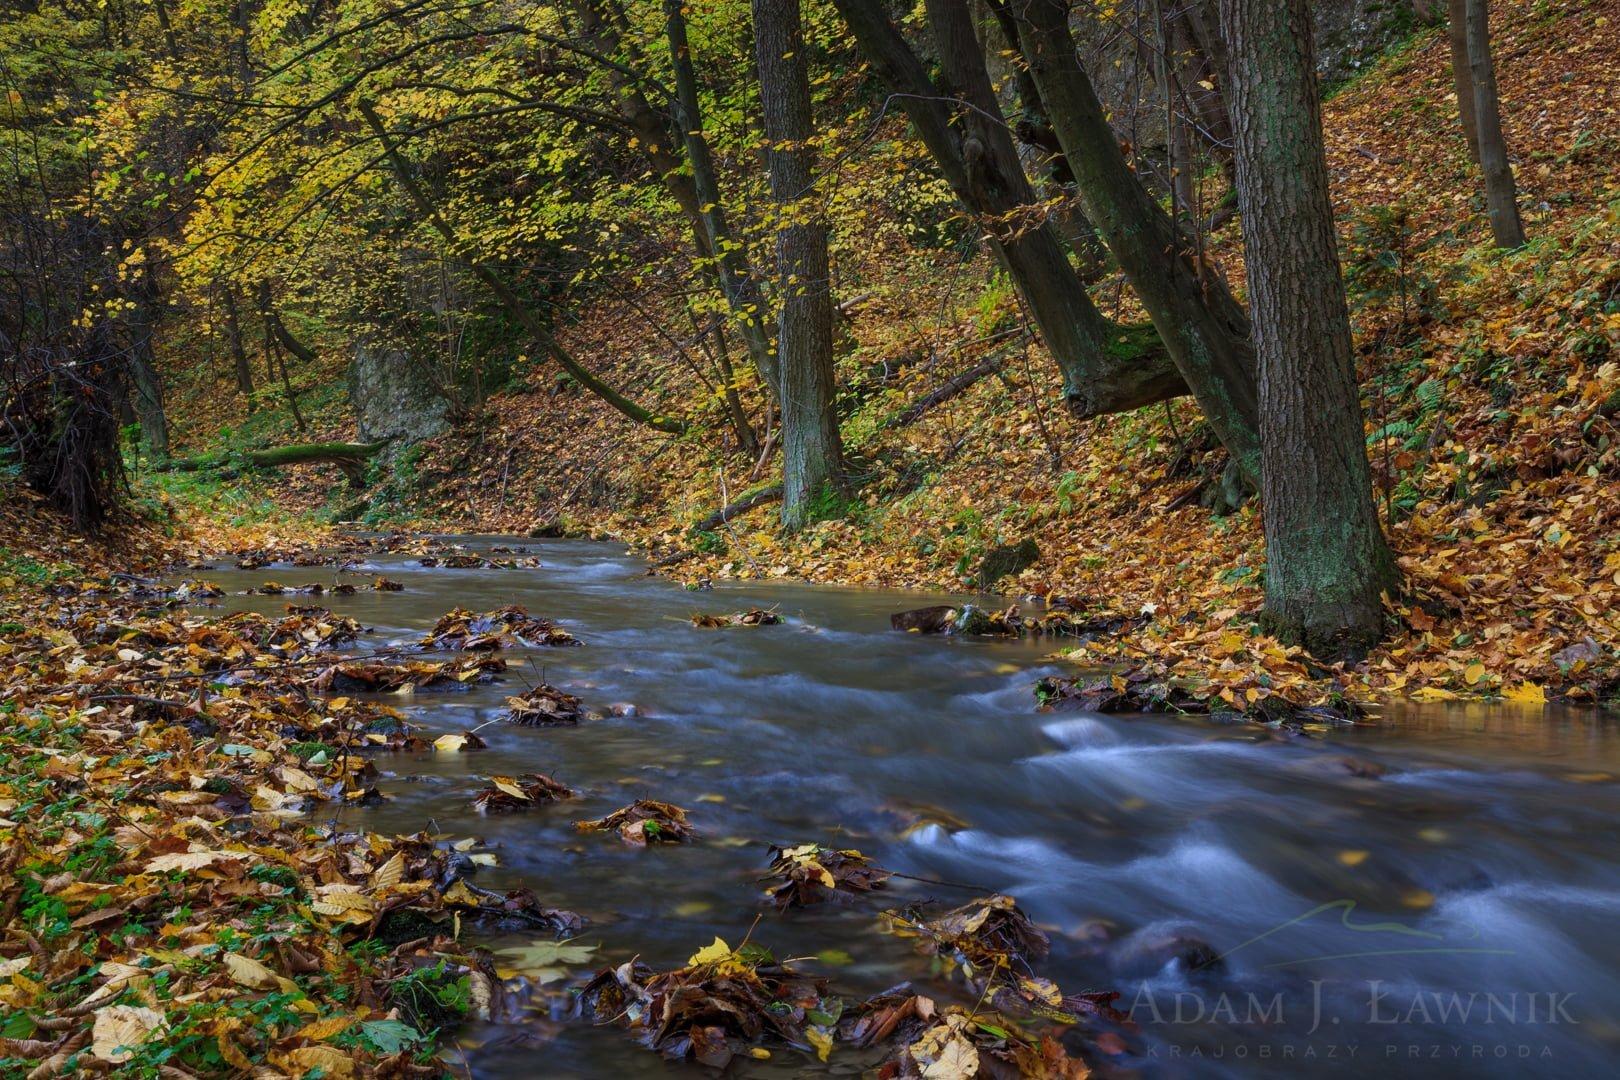 Ojców National Park, Poland 0810-00955C